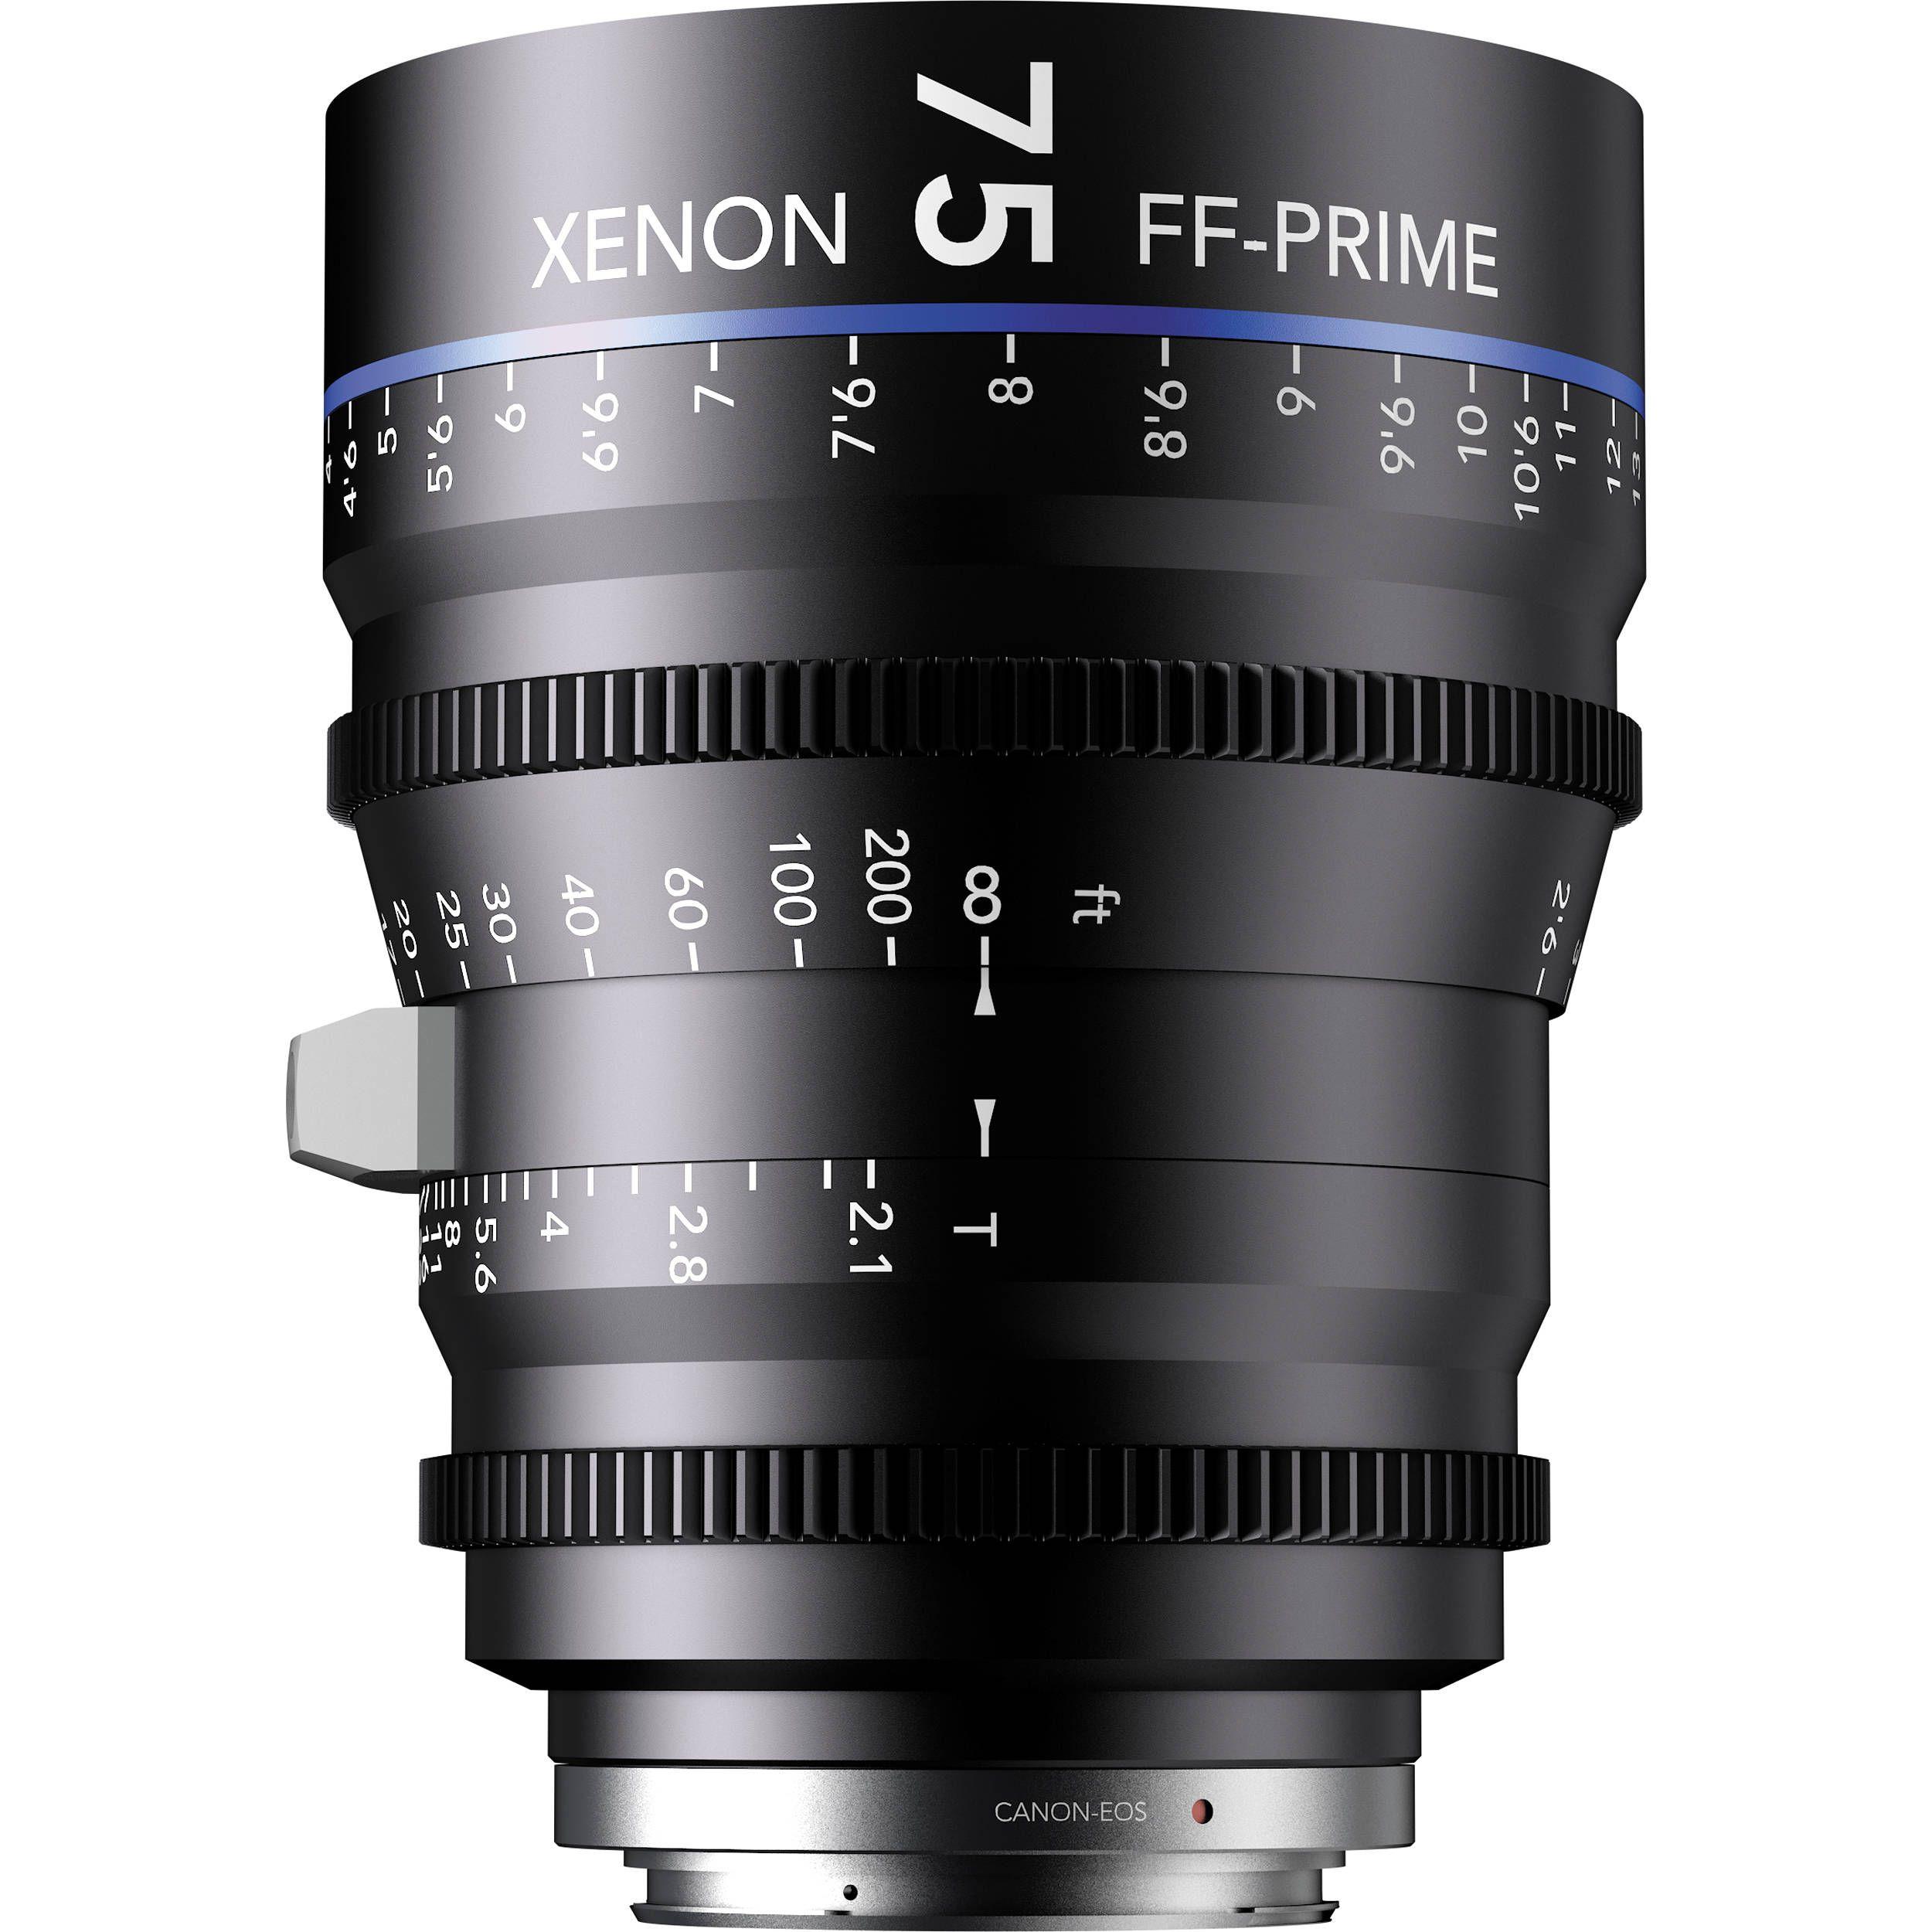 Schneider Kreuznach FF-Prime XN 2.1/75 EF Video-Objektiv [Canon EOS]